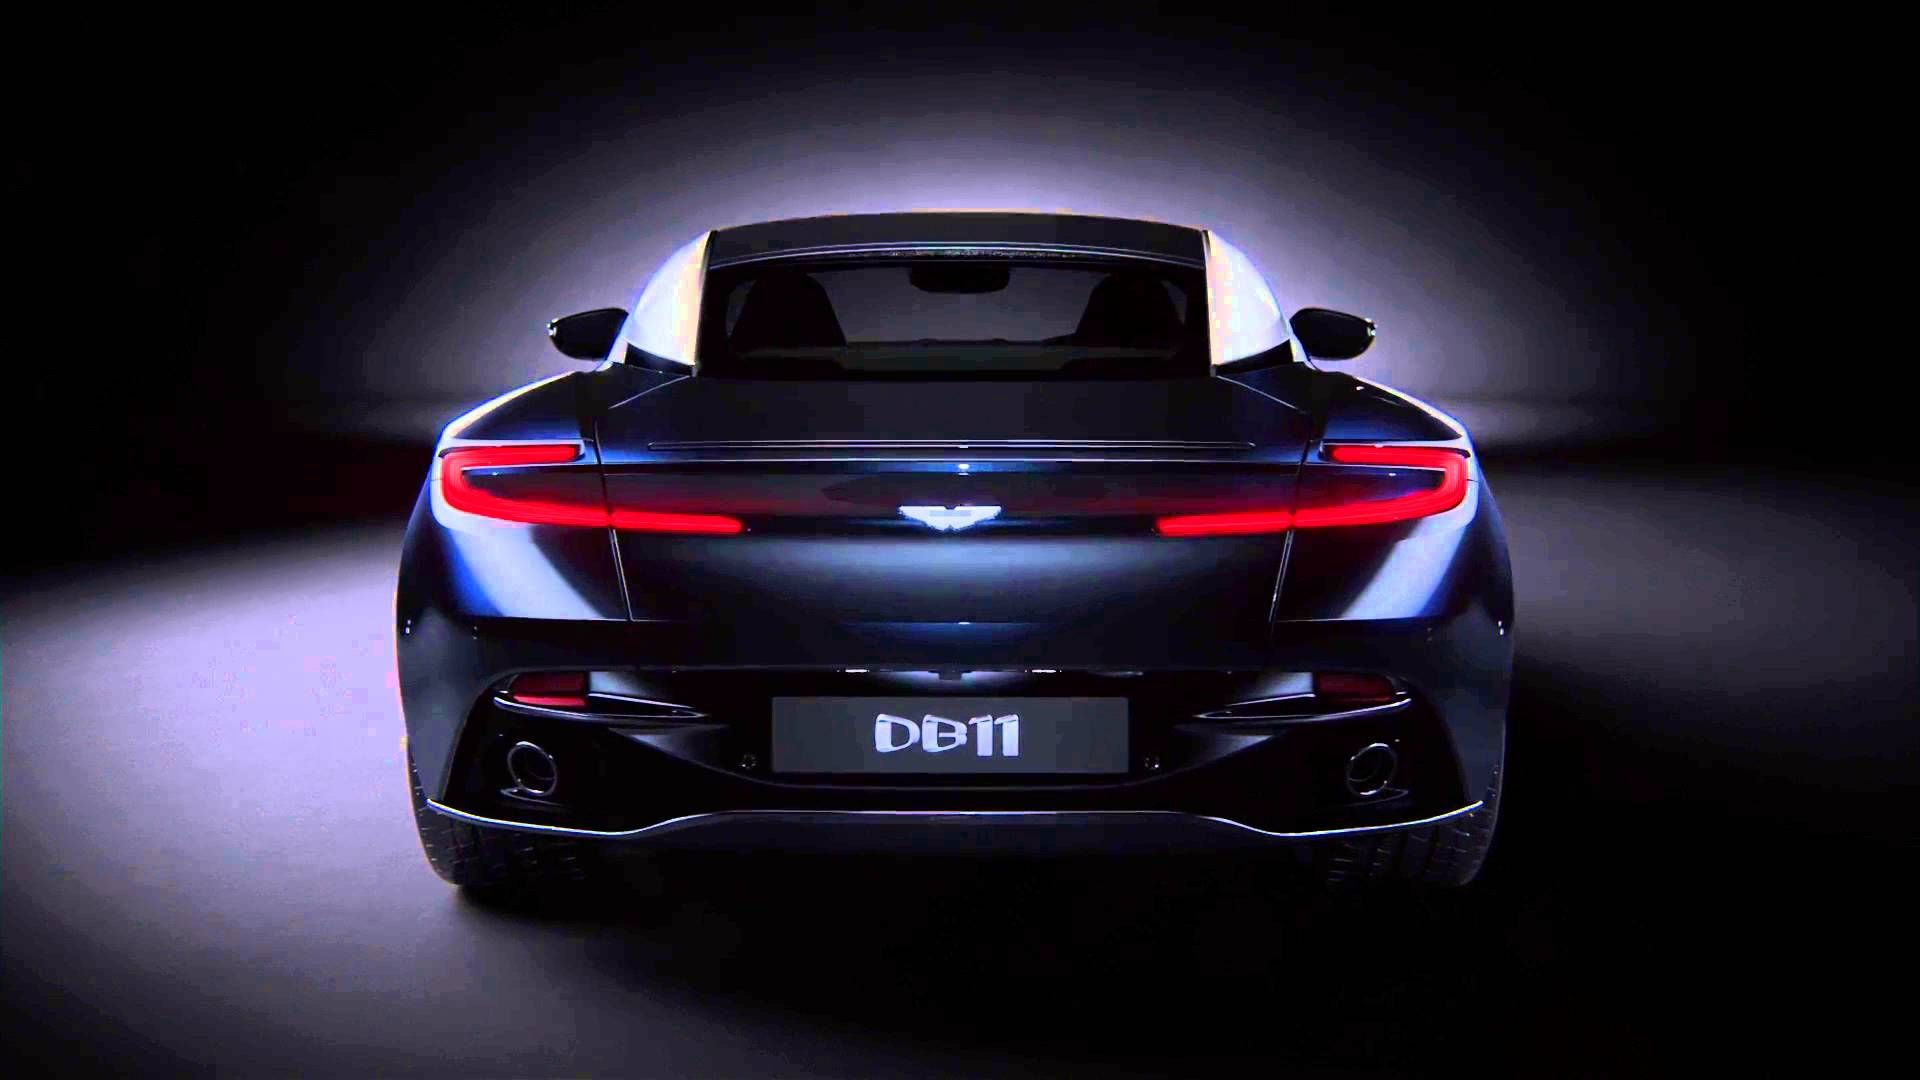 WATCH 2017 Aston Martin DB11 Trailer Exotic Cars